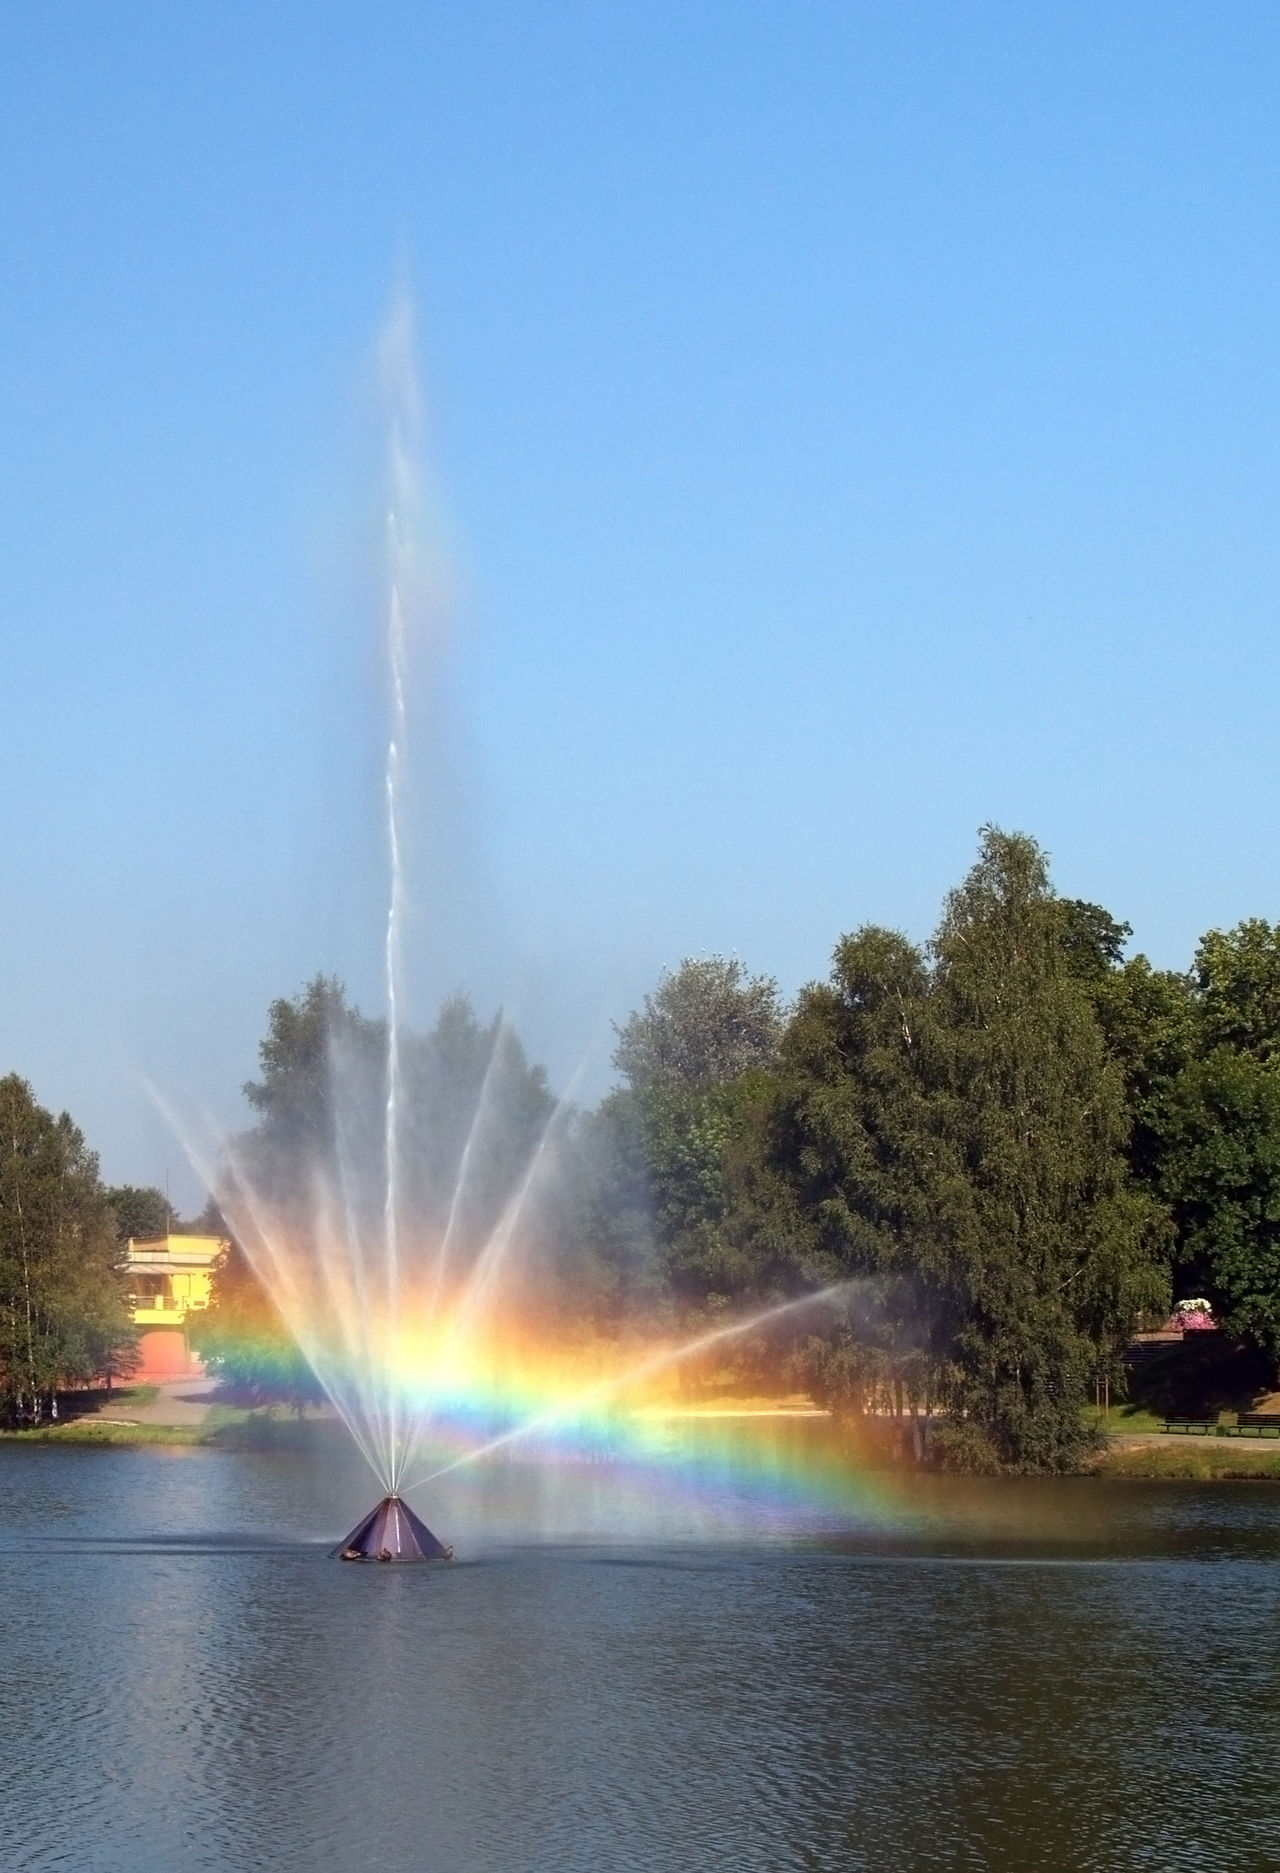 Fountain with rainbow in the small lake in resort town Druskininkai, Lithuania. Day Druskininkai Dancing Fontain Druskininkai Lithuania 🇱🇹 Fountain Fountain Rainbow Lake No People Outdoors Rainbow🌈 Sky Splashing Spraying Tree Water